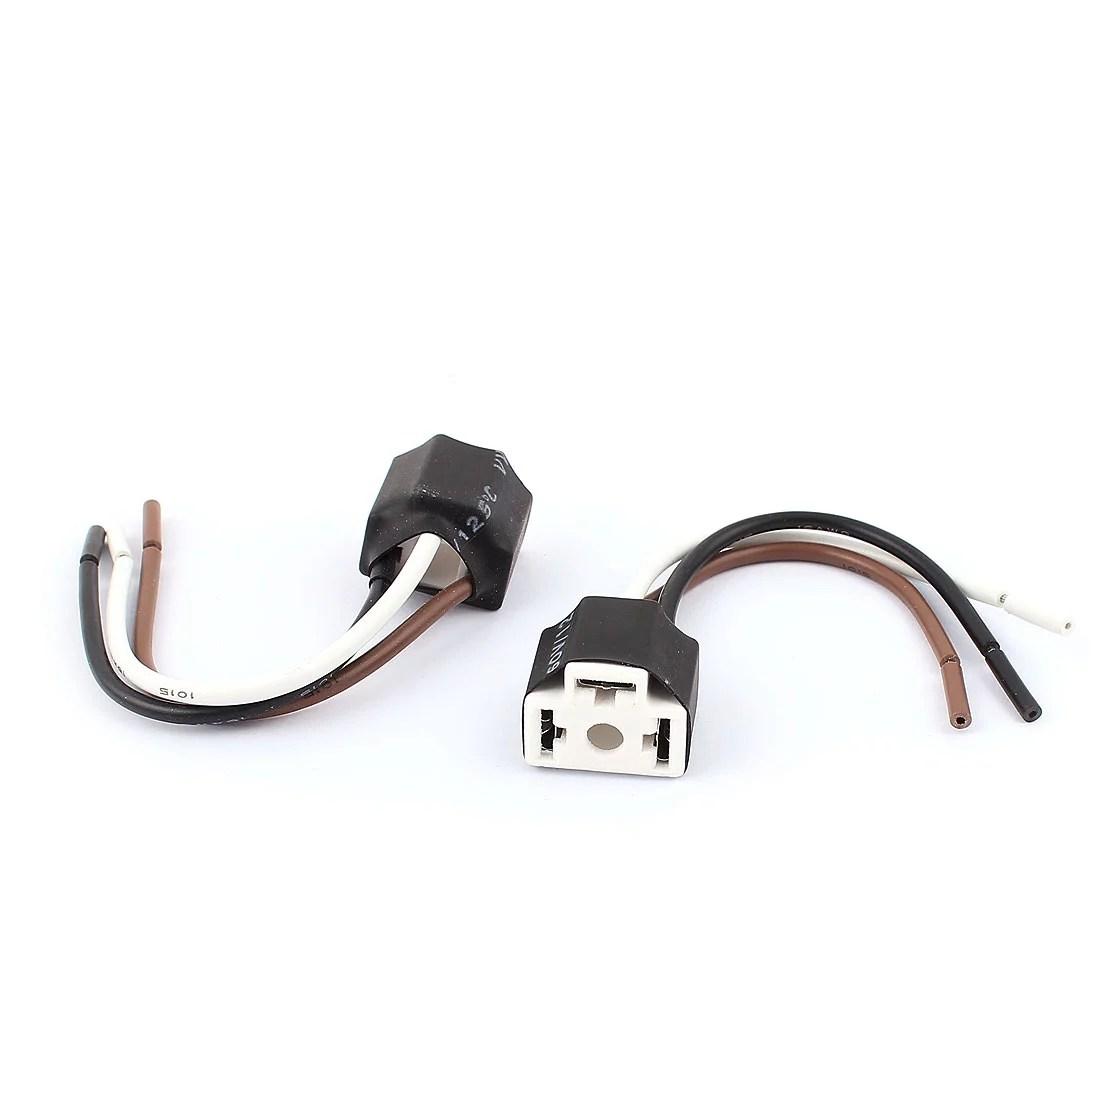 hight resolution of car headlight bulb lamp h4 socket wiring wire harness connector adapter 2pcs walmart com